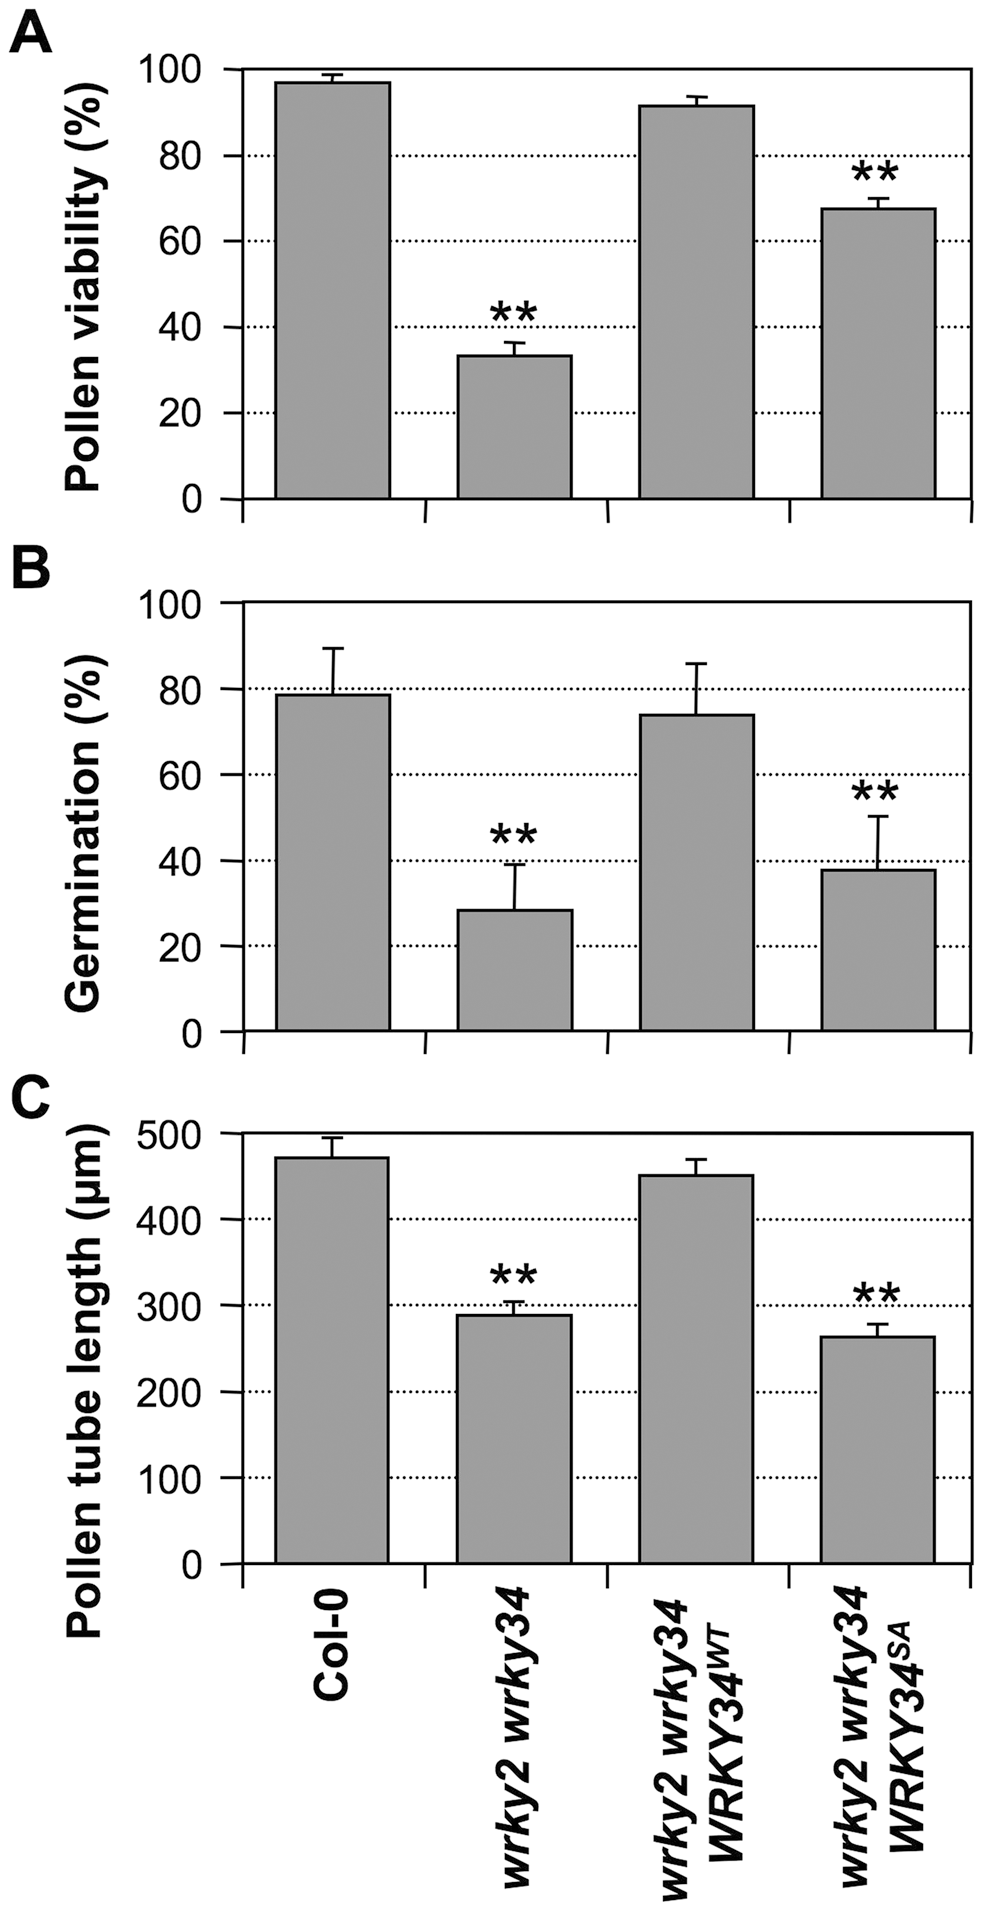 Complementation of <i>wrky2-1 wrky34-1</i> double mutant pollen phenotypes by <i>WRKY34<sup>WT</sup></i> and <i>WRKY34<sup>SA</sup></i>.